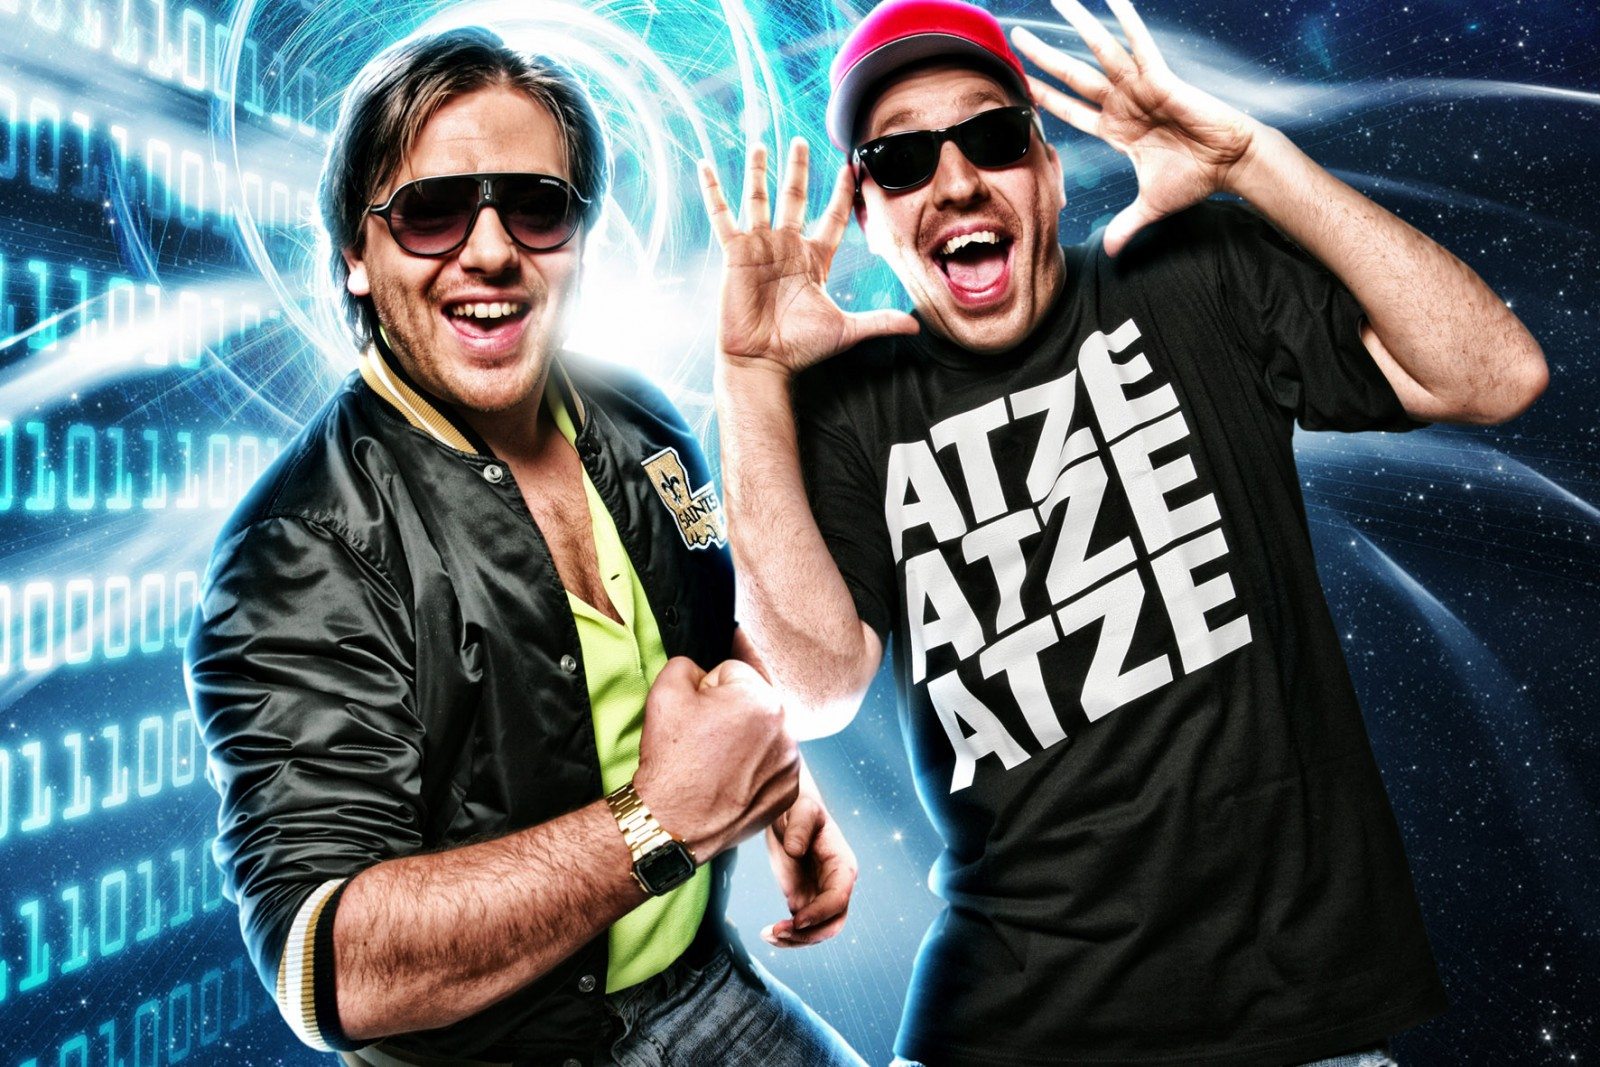 Mallorca-Party - Die Atzen, Loona, Lorenz Büffel u.a. - Hessenhalle  - Alsfeld